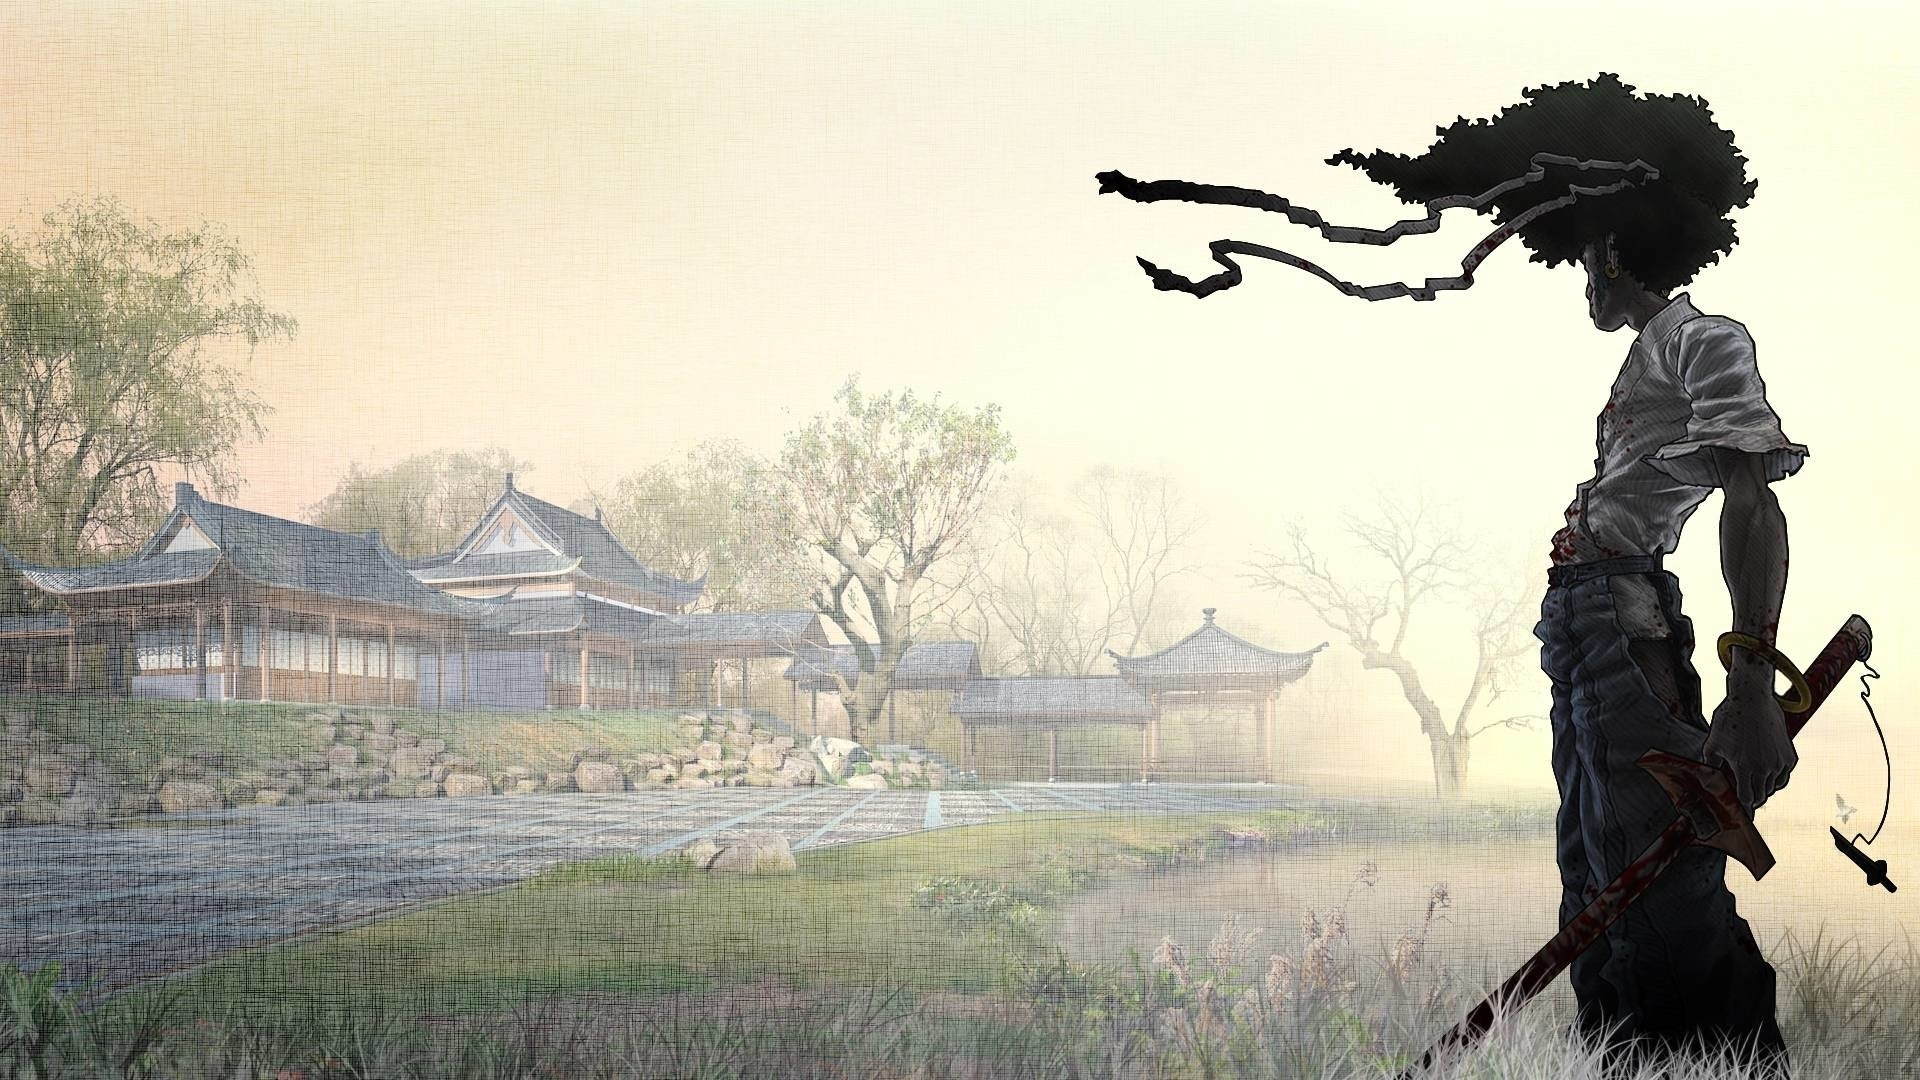 afro samurai full hd fond d'écran and arrière-plan | 1920x1080 | id